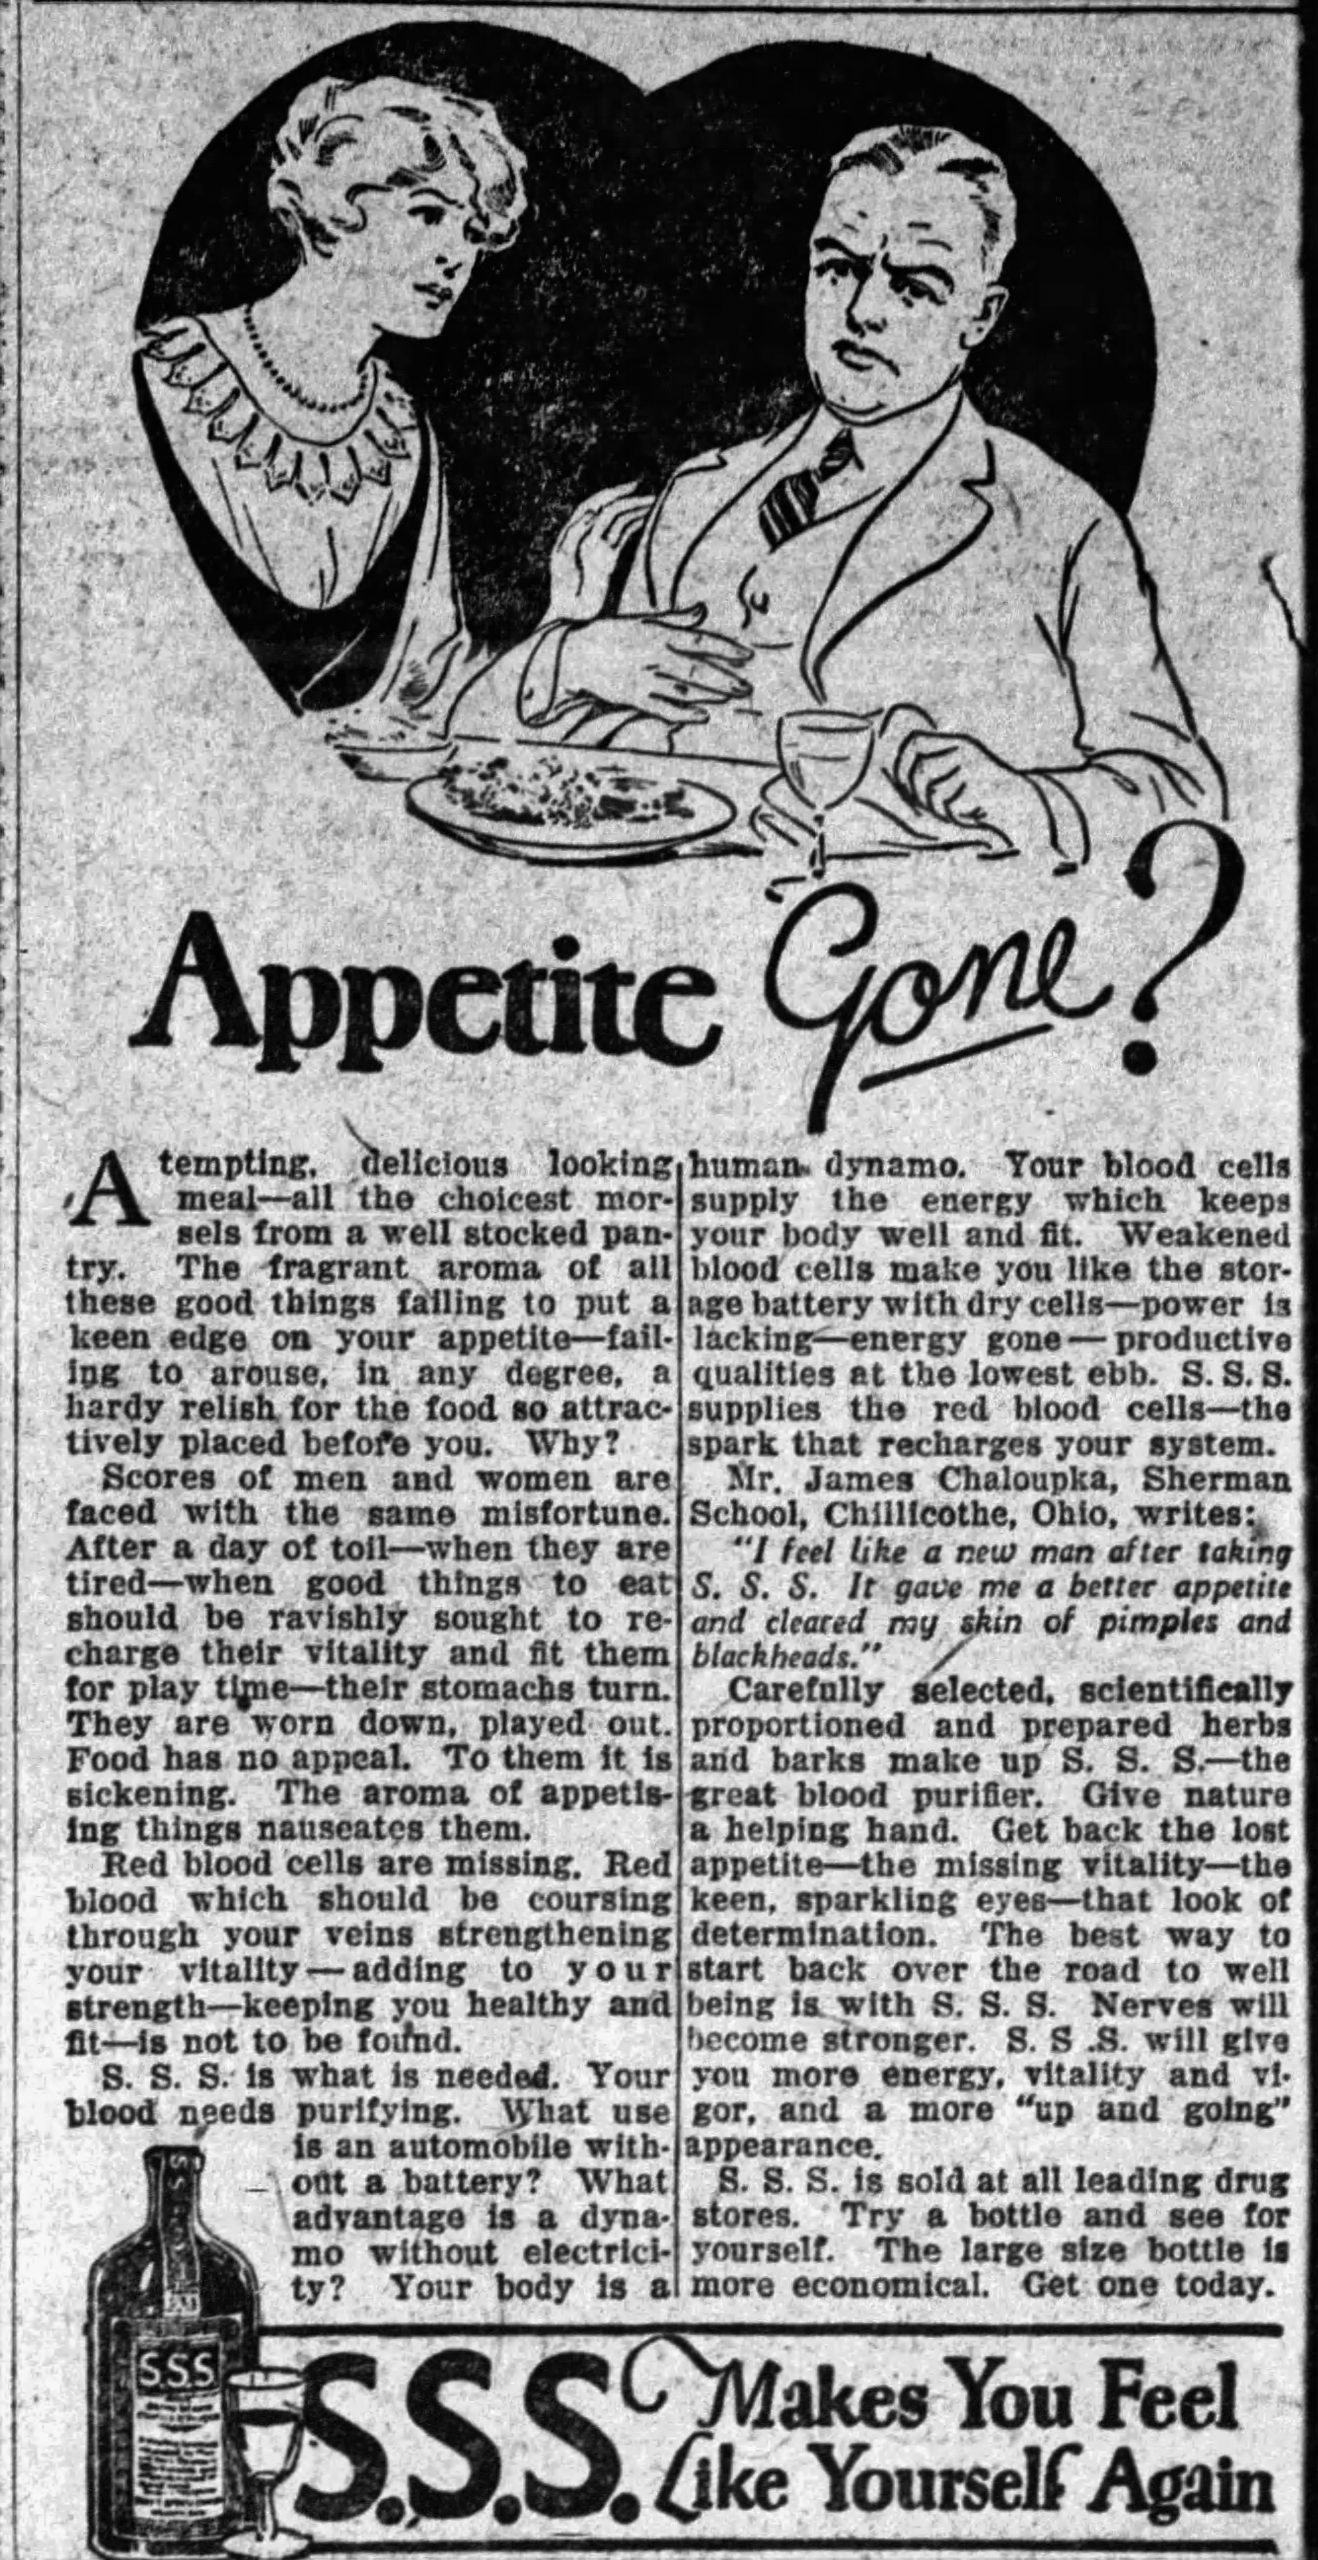 PATRON + Deputy Hurt by Alleged 'Leggers in Dec. 1923 & Drunkards high code of honor